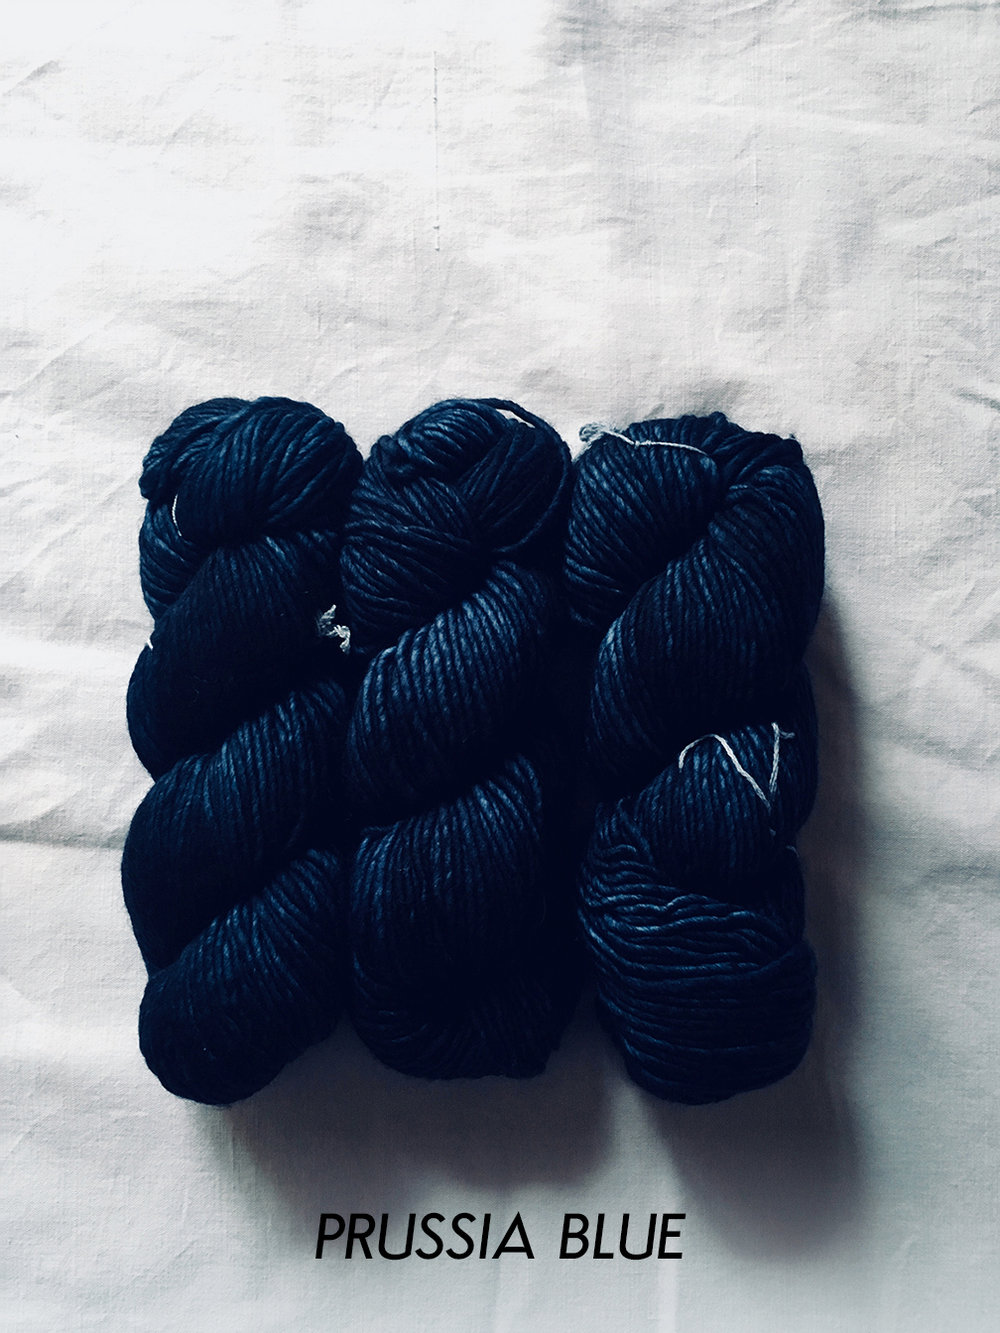 malabrigo_mecha_prussia_blue_046_wool_done_knitting.jpg